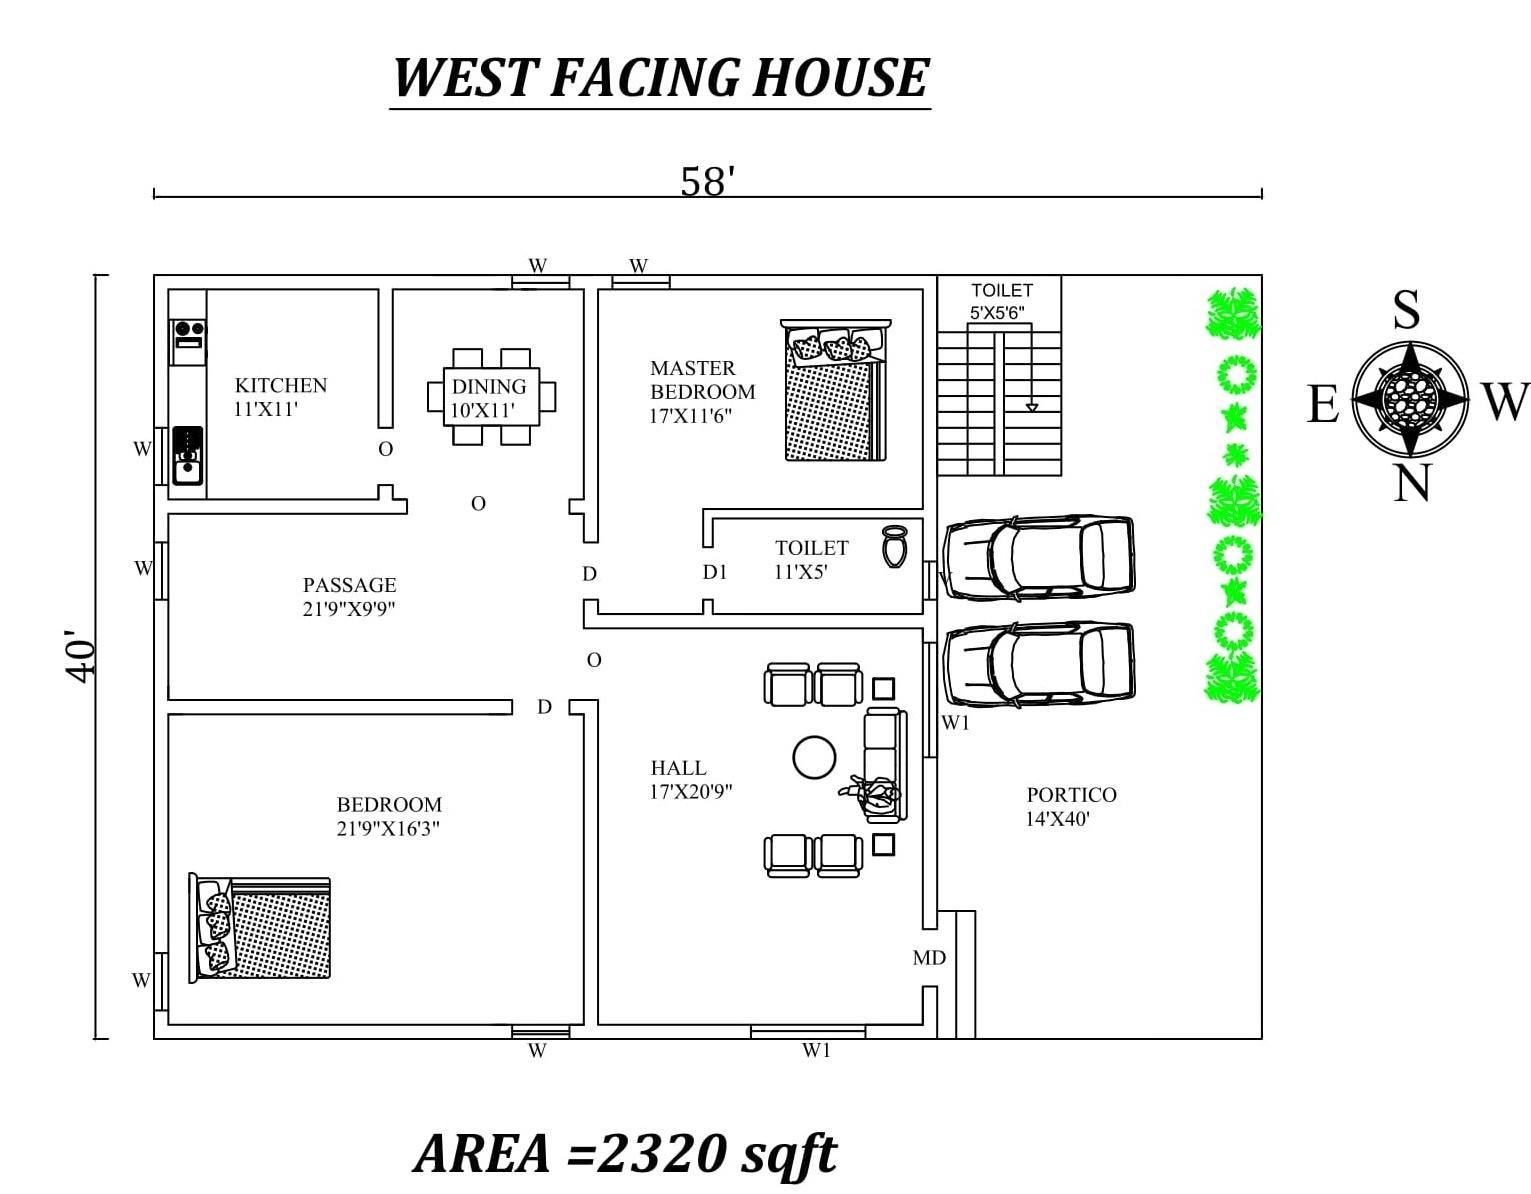 58 x40 2 bhk west facing house plan as per vastu shatra